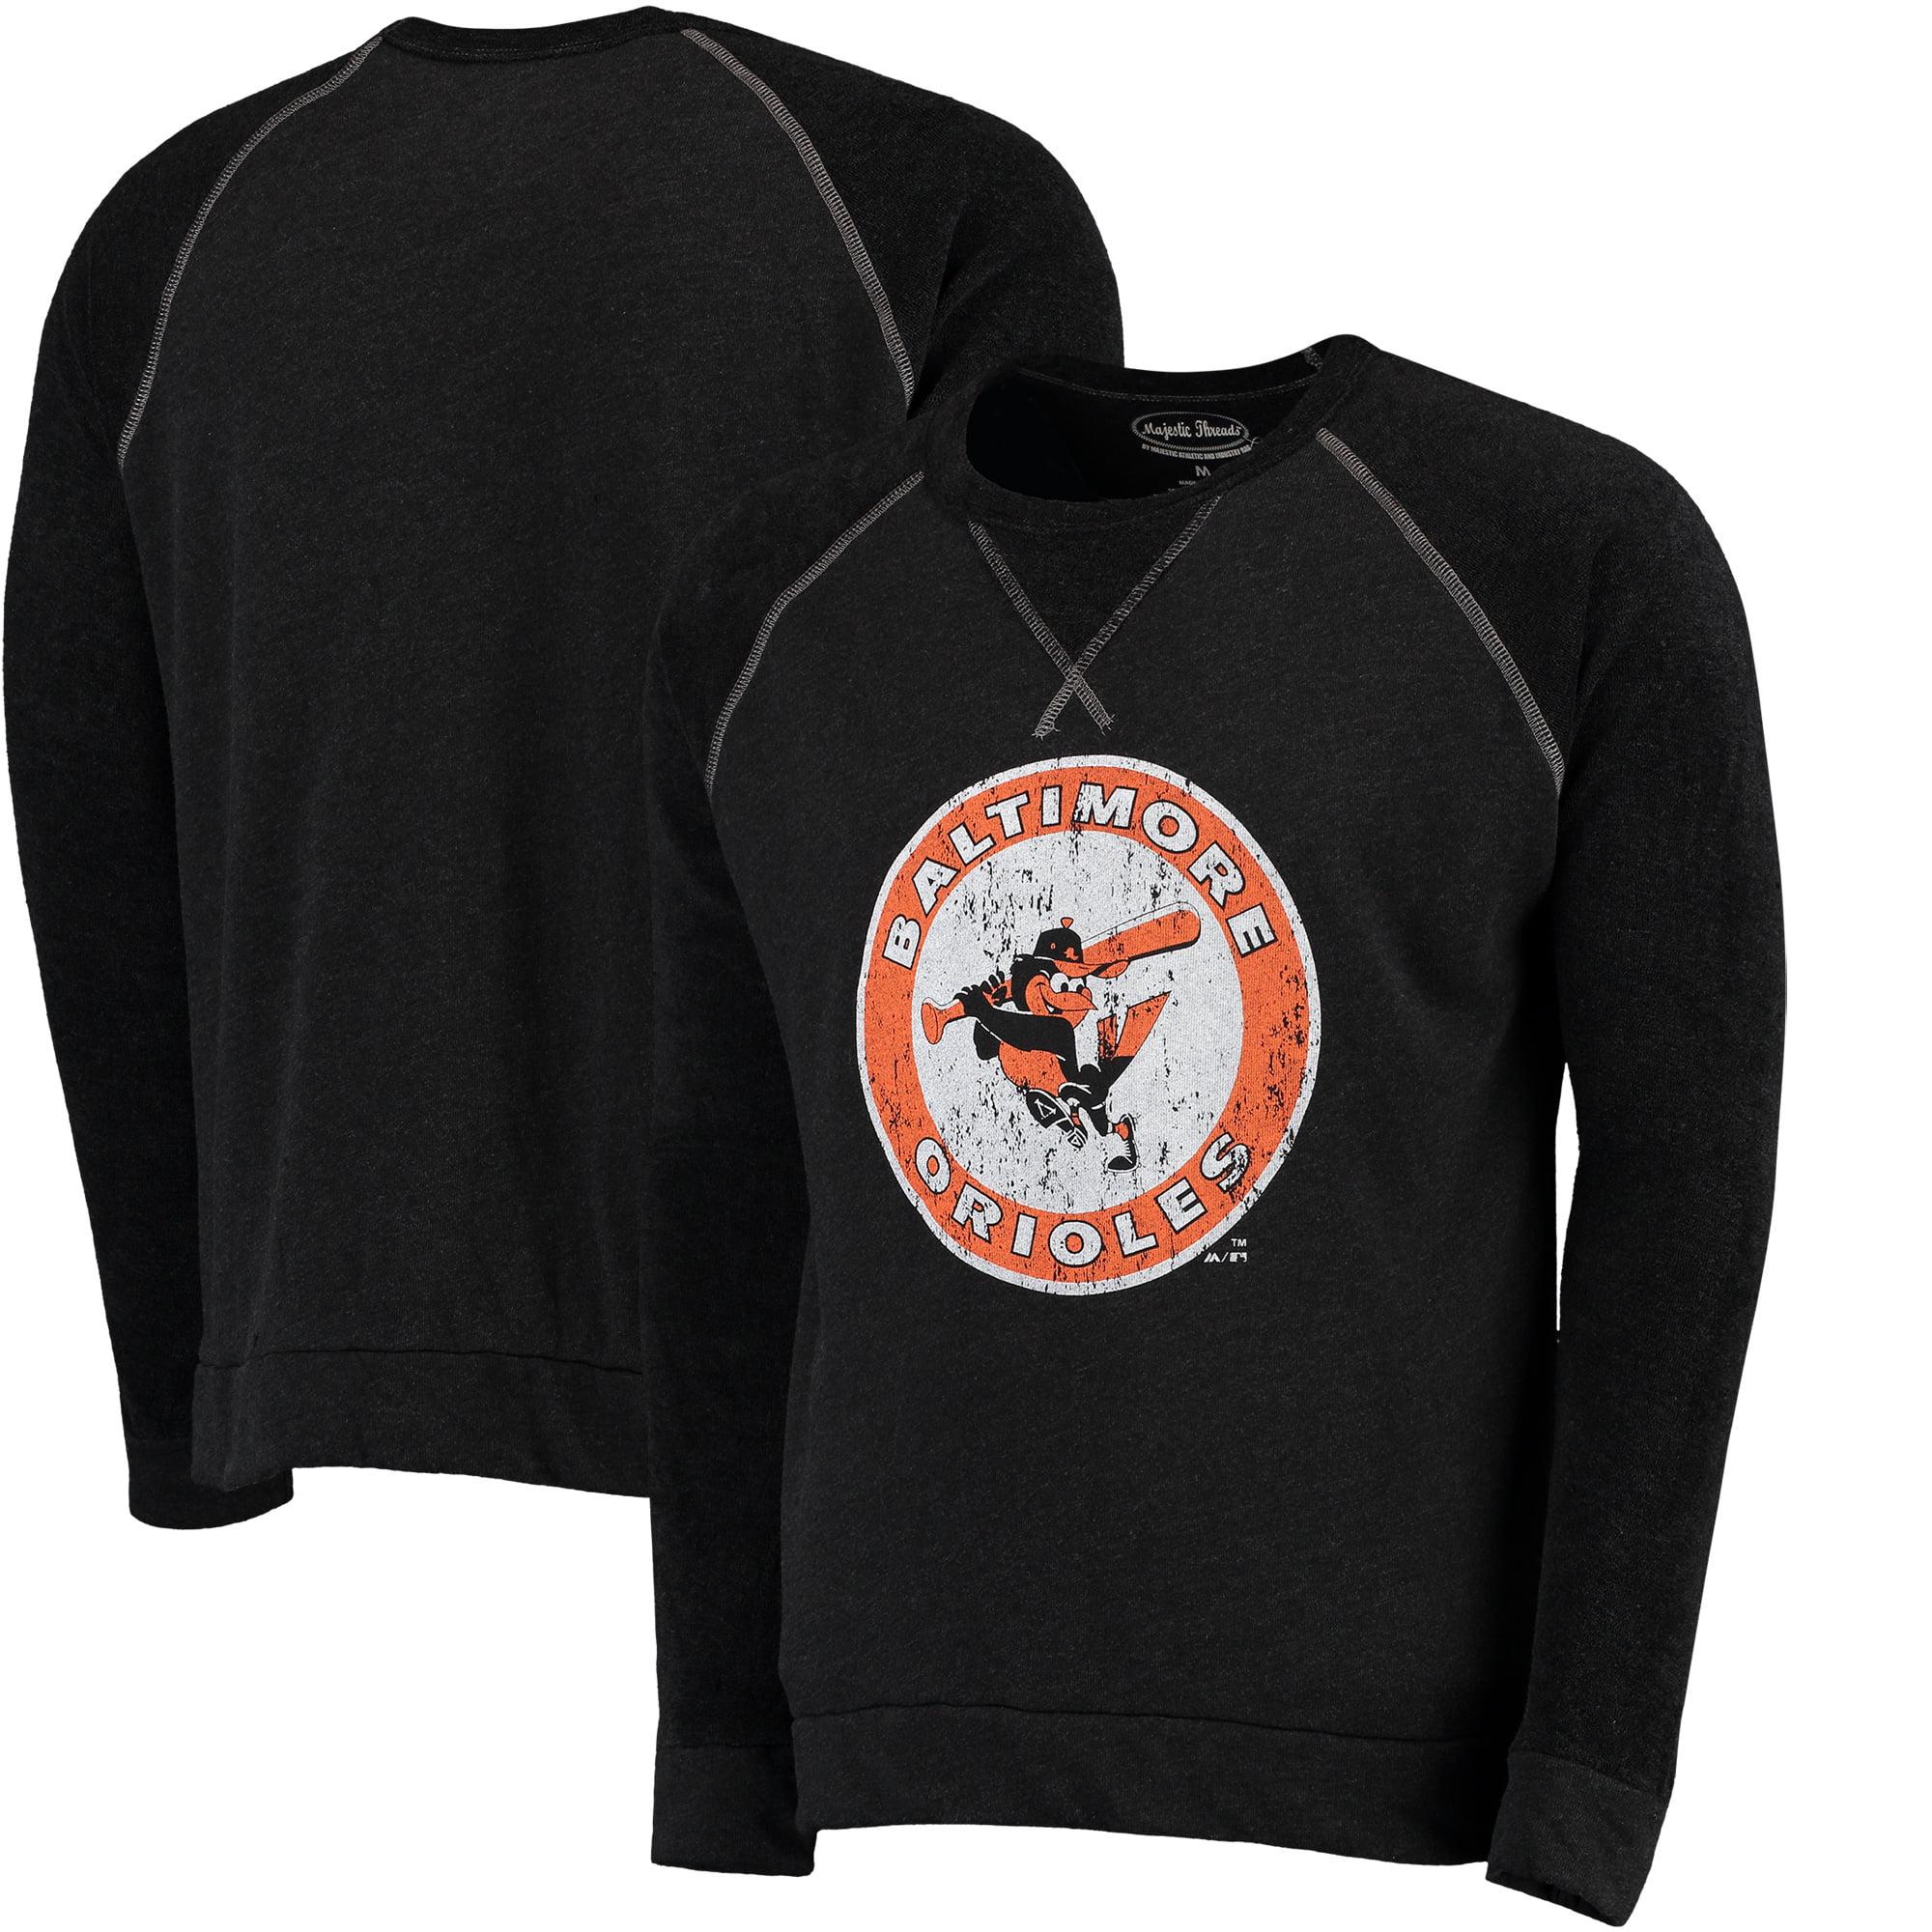 Baltimore Orioles Majestic Threads Vintage Terry Crew Raglan Sweatshirt - Black